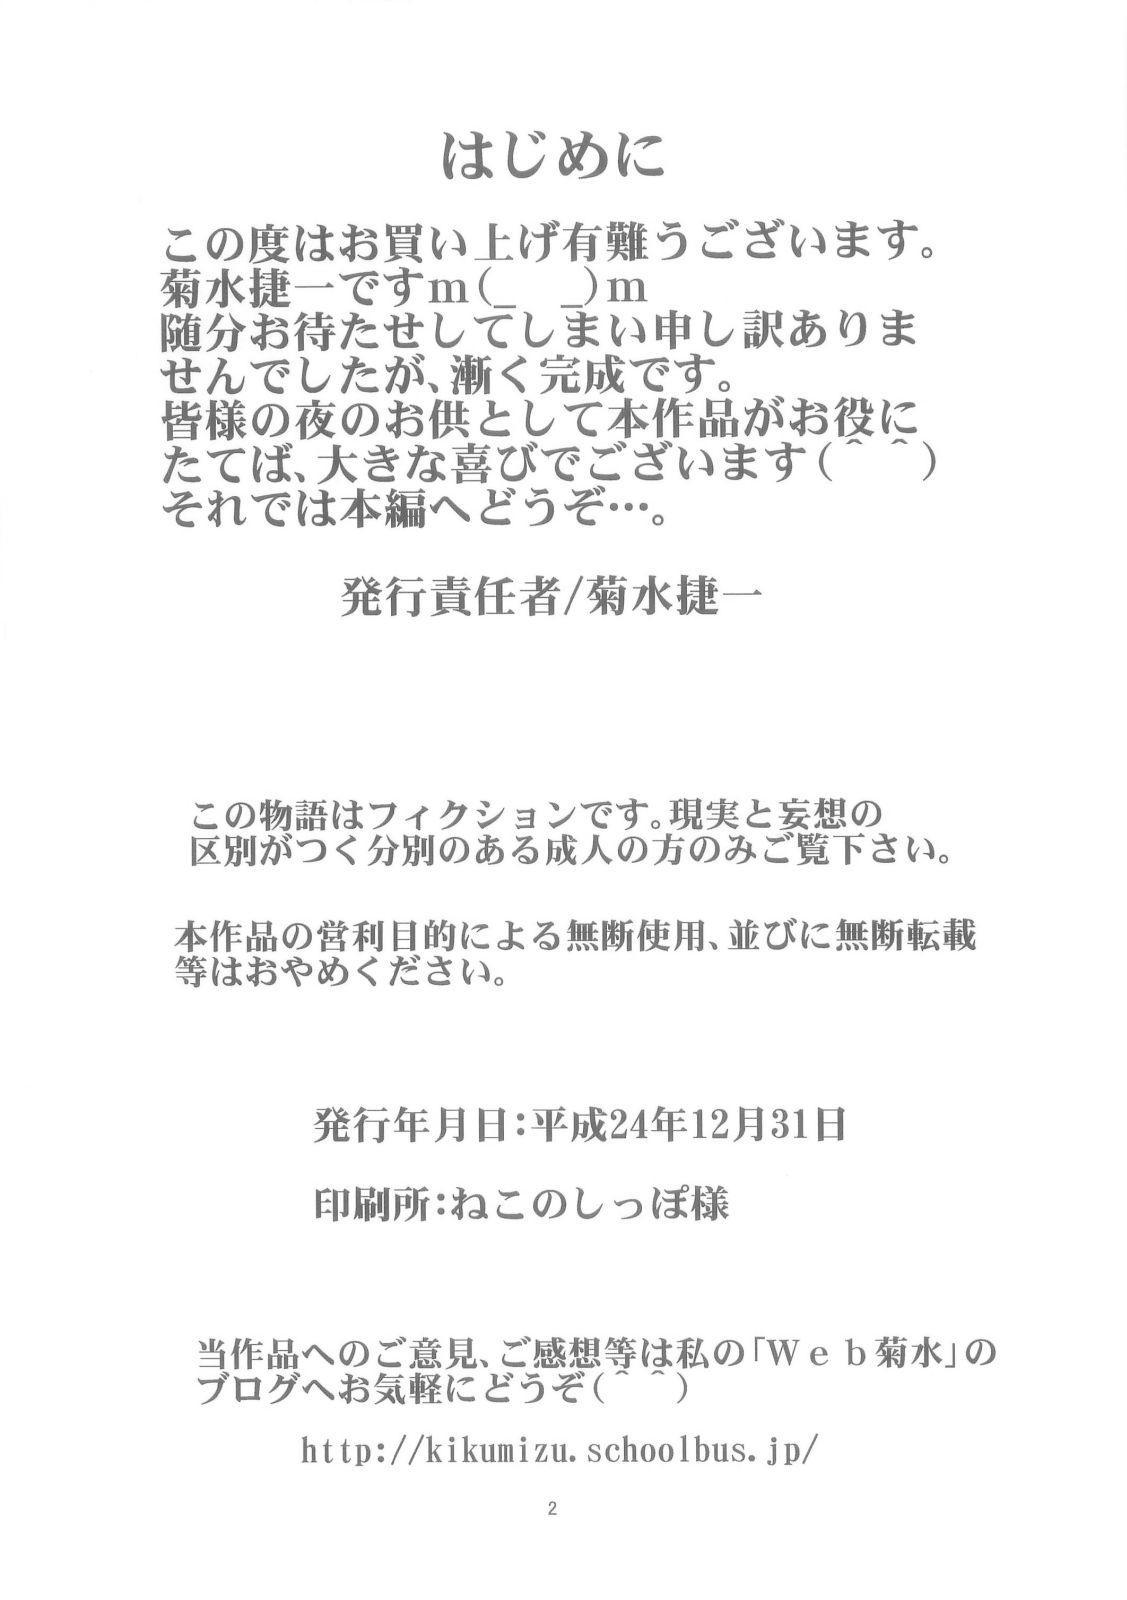 (C83) [Kikumizuan (Kikumizu Shouichi)] Lovely Erotics ~ K*i no Baai ~   Lovely Erotics -The Case of K*i- (Dirty Pair) 3